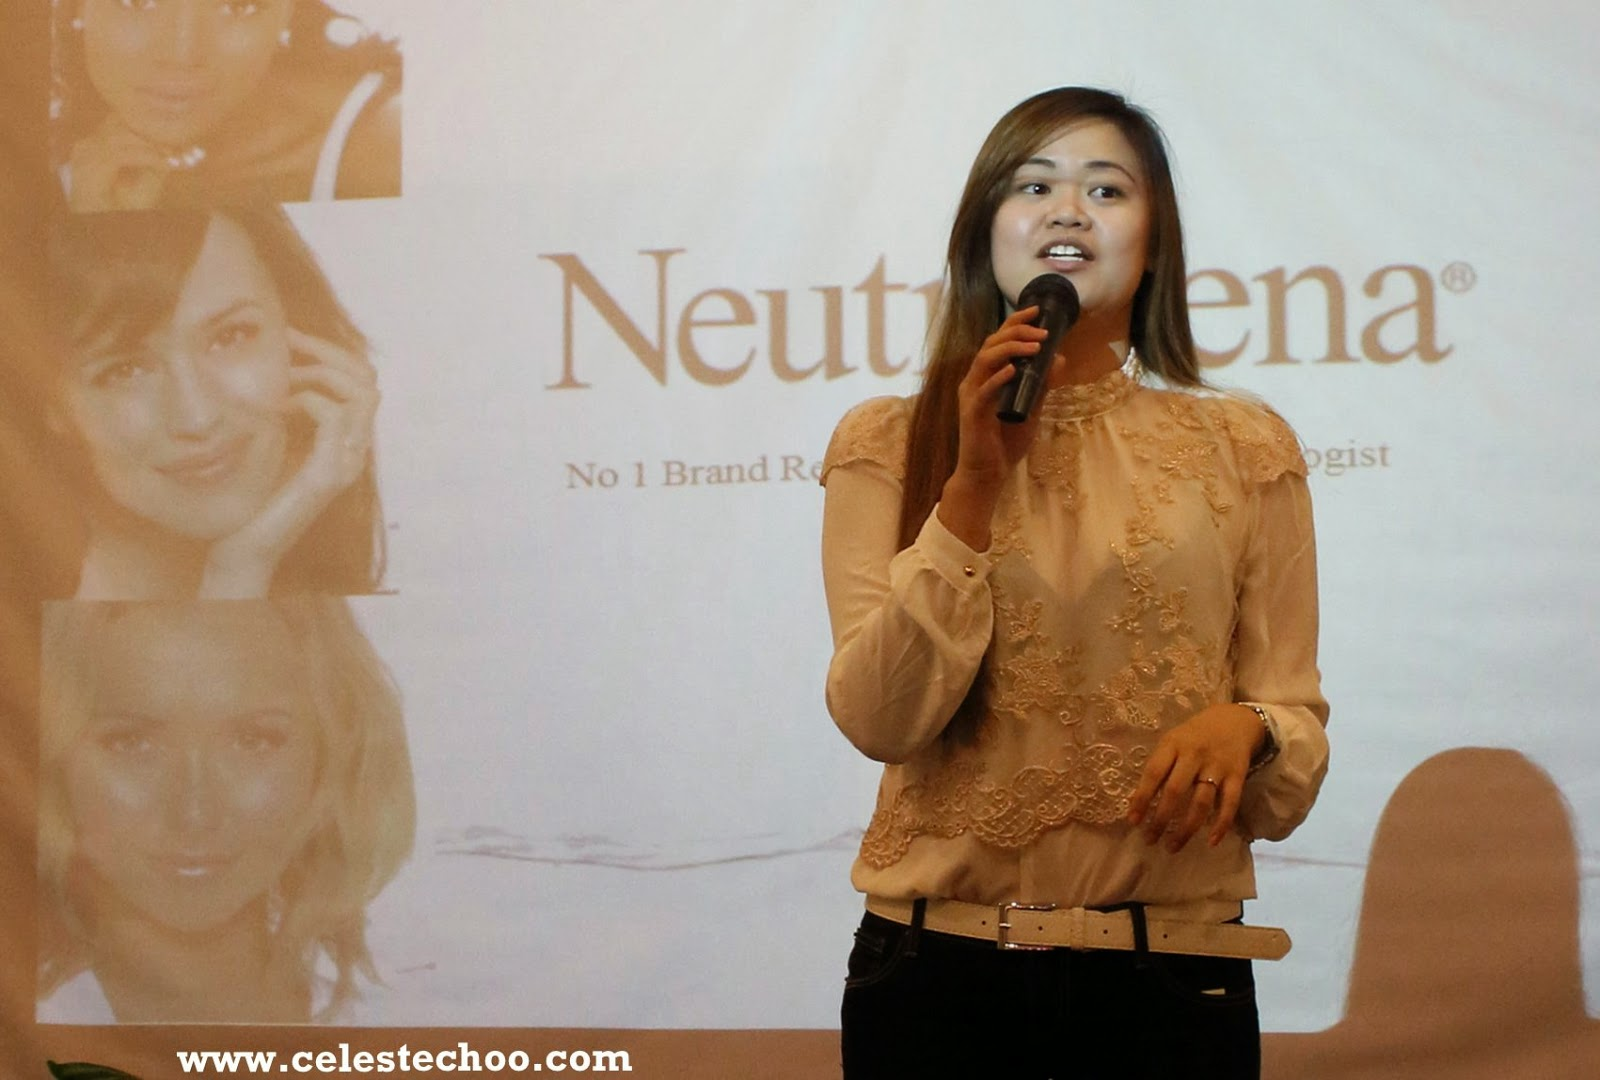 neutrogena_60th_anniversary_neuwomen_pampering_event